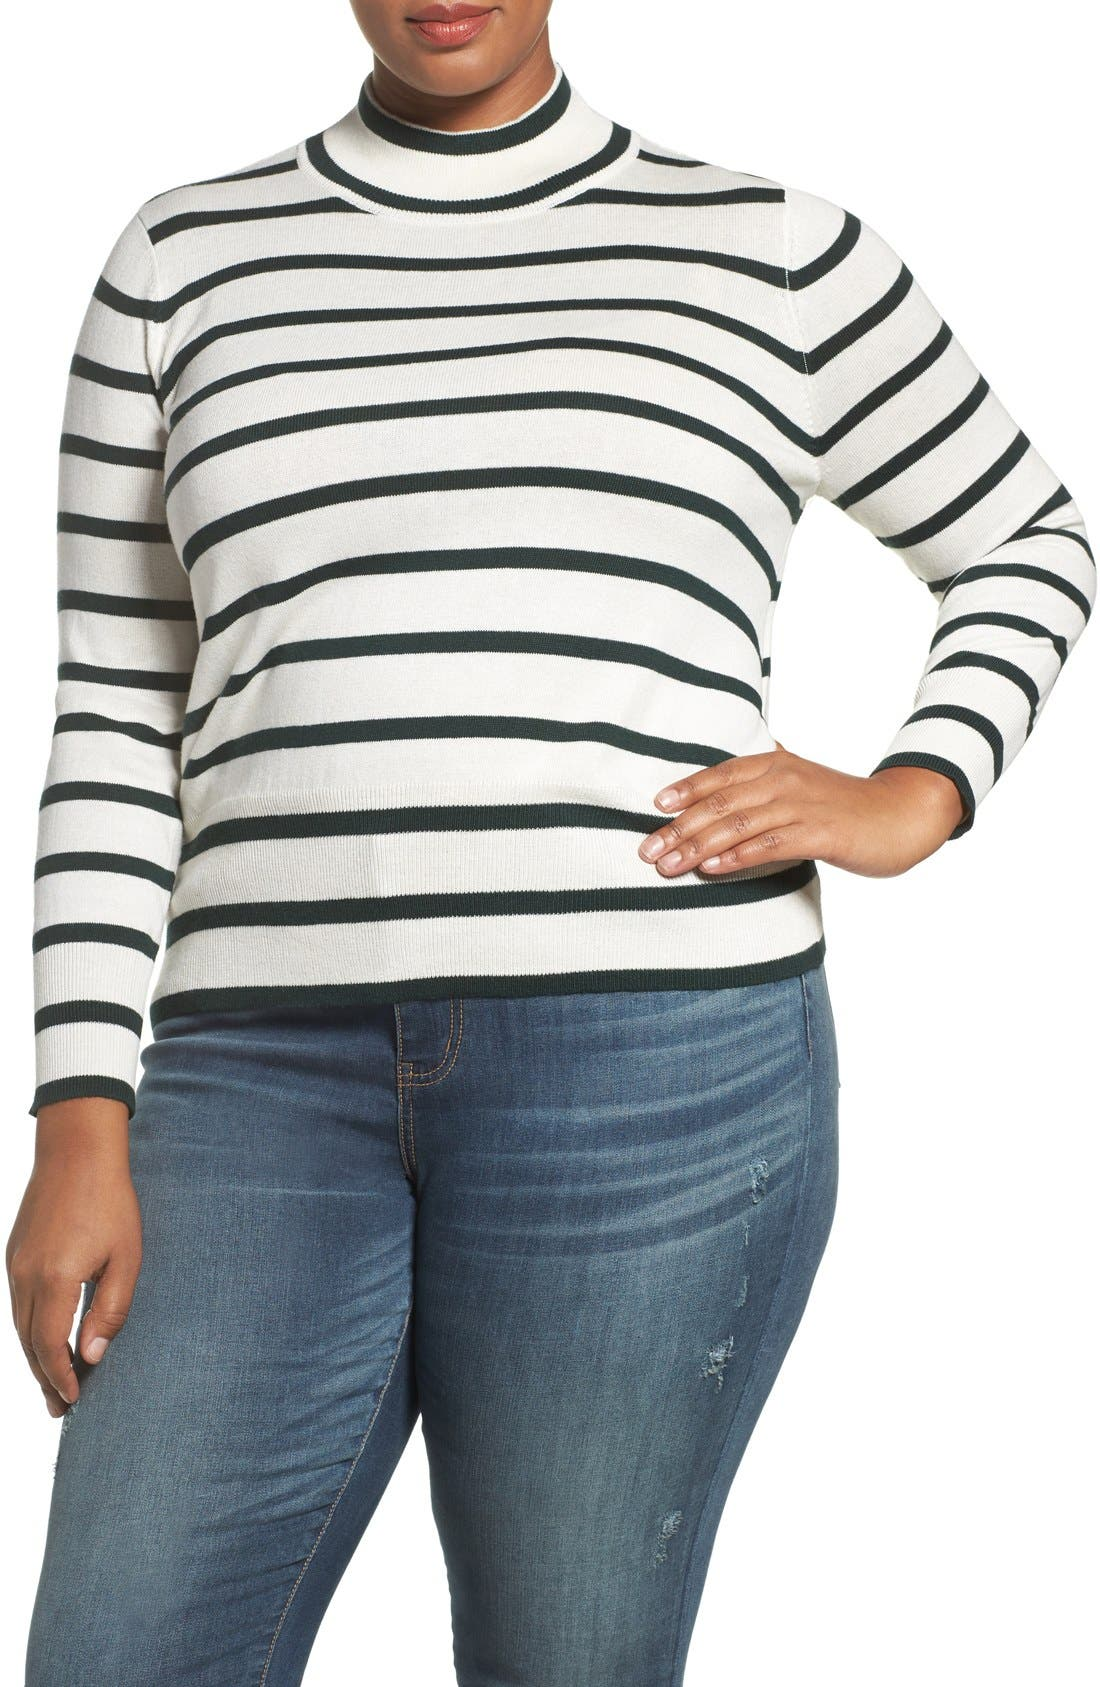 Alternate Image 1 Selected - Melissa McCarthy Seven7 Stripe Mock Neck Sweater (Plus Size)